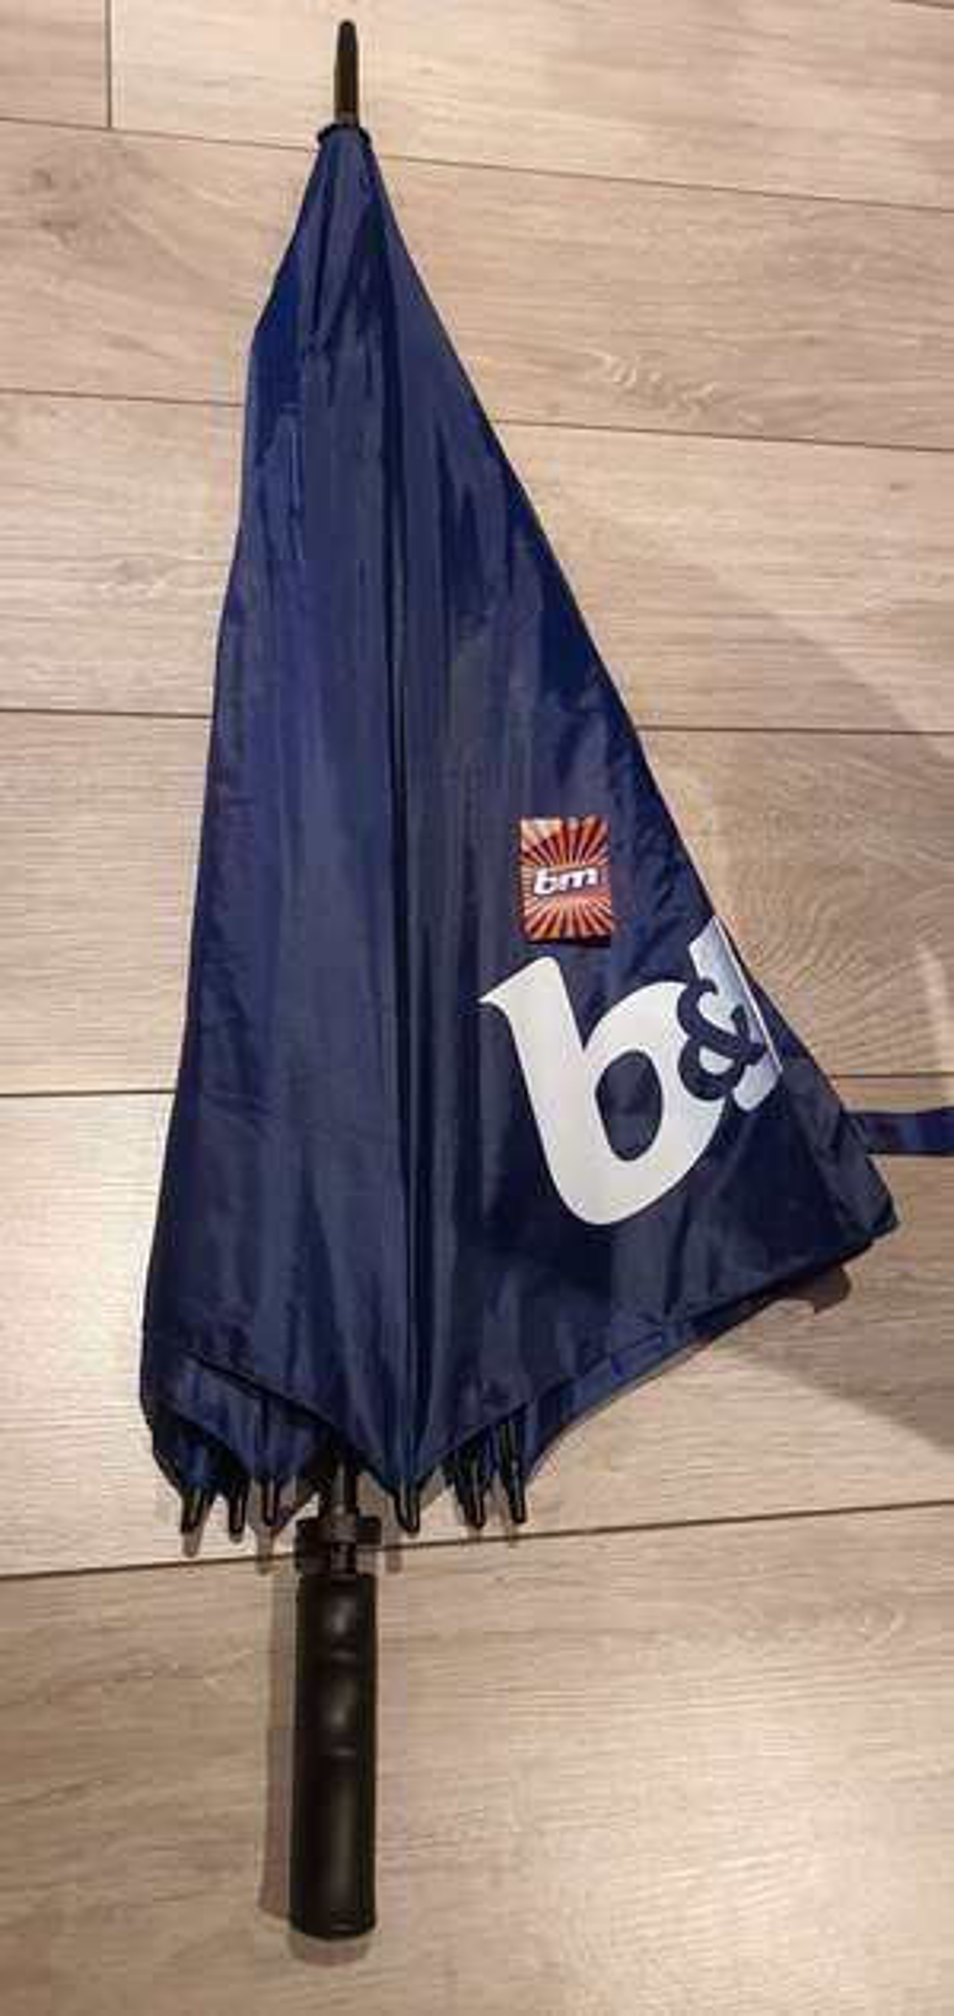 B&M branded Umbrella - £2 instore @ B&M (Alfreton)